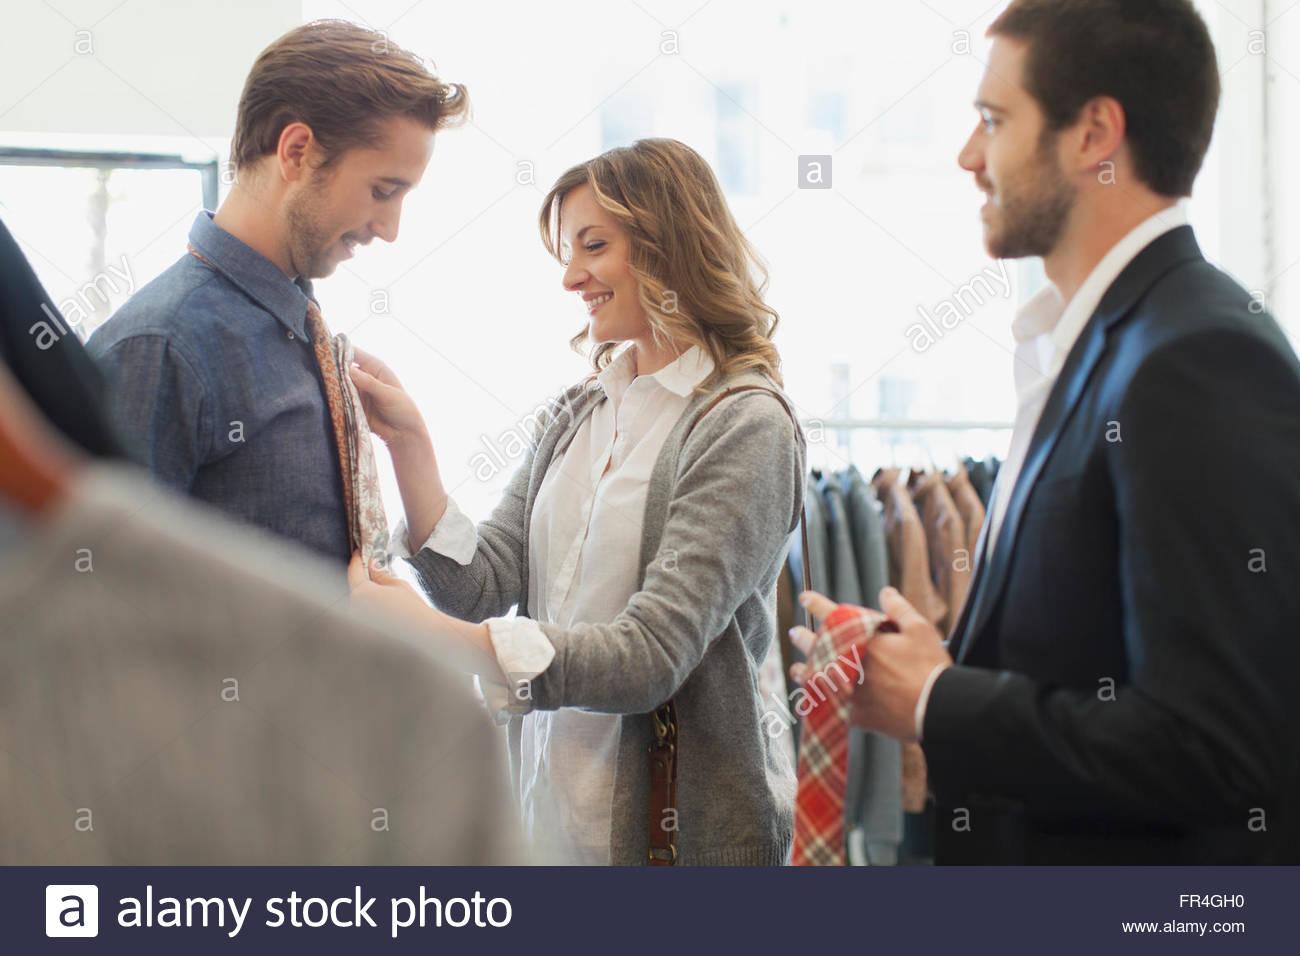 Sales clerk offering necktie options to couple. - Stock Image